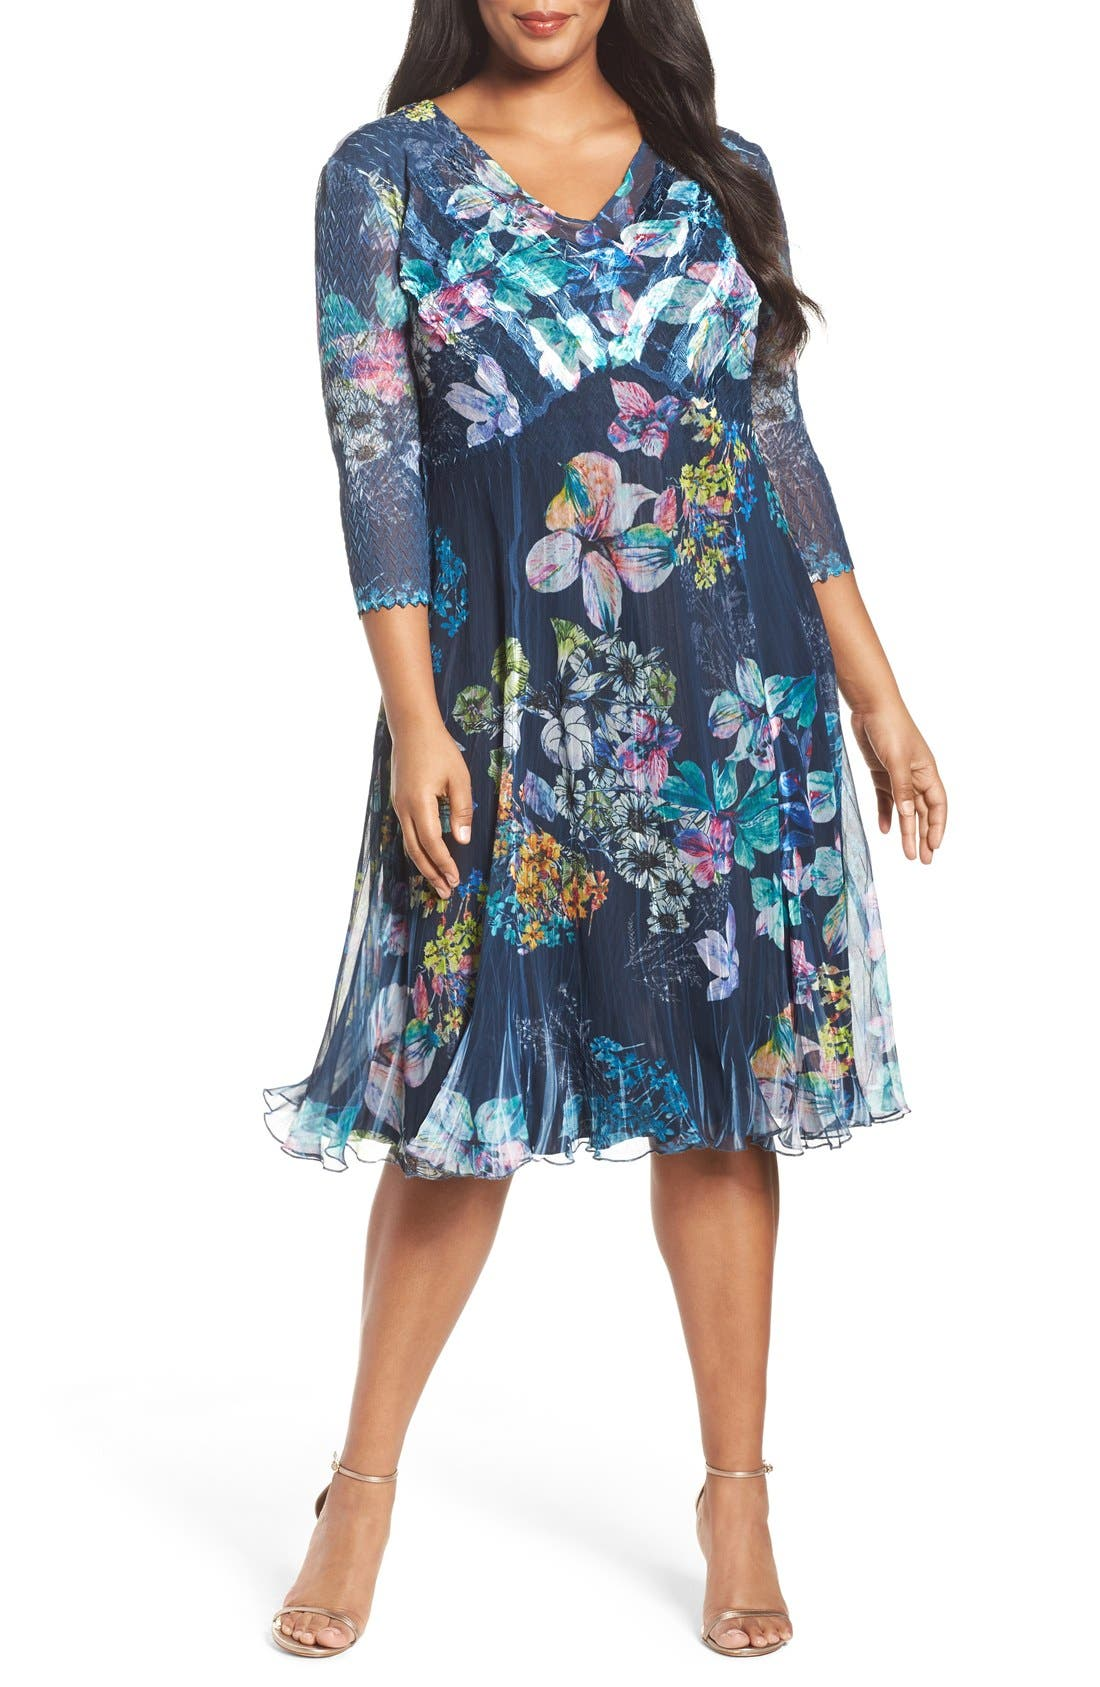 Alternate Image 1 Selected - Komarov Chiffon A-Line Dress (Plus Size)